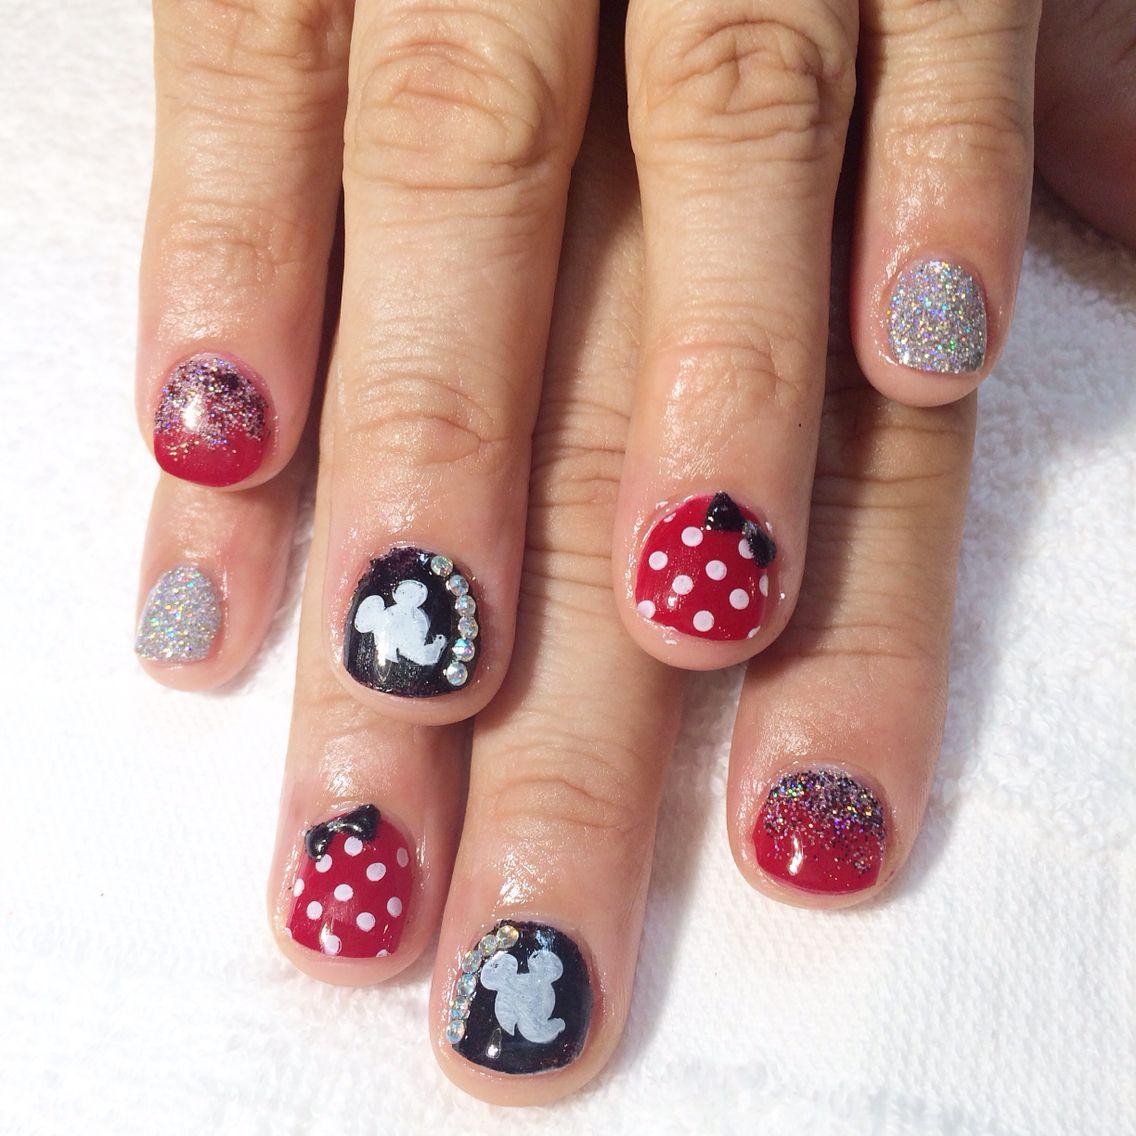 Disney inspired nails acrylic overlay   Nails   Pinterest